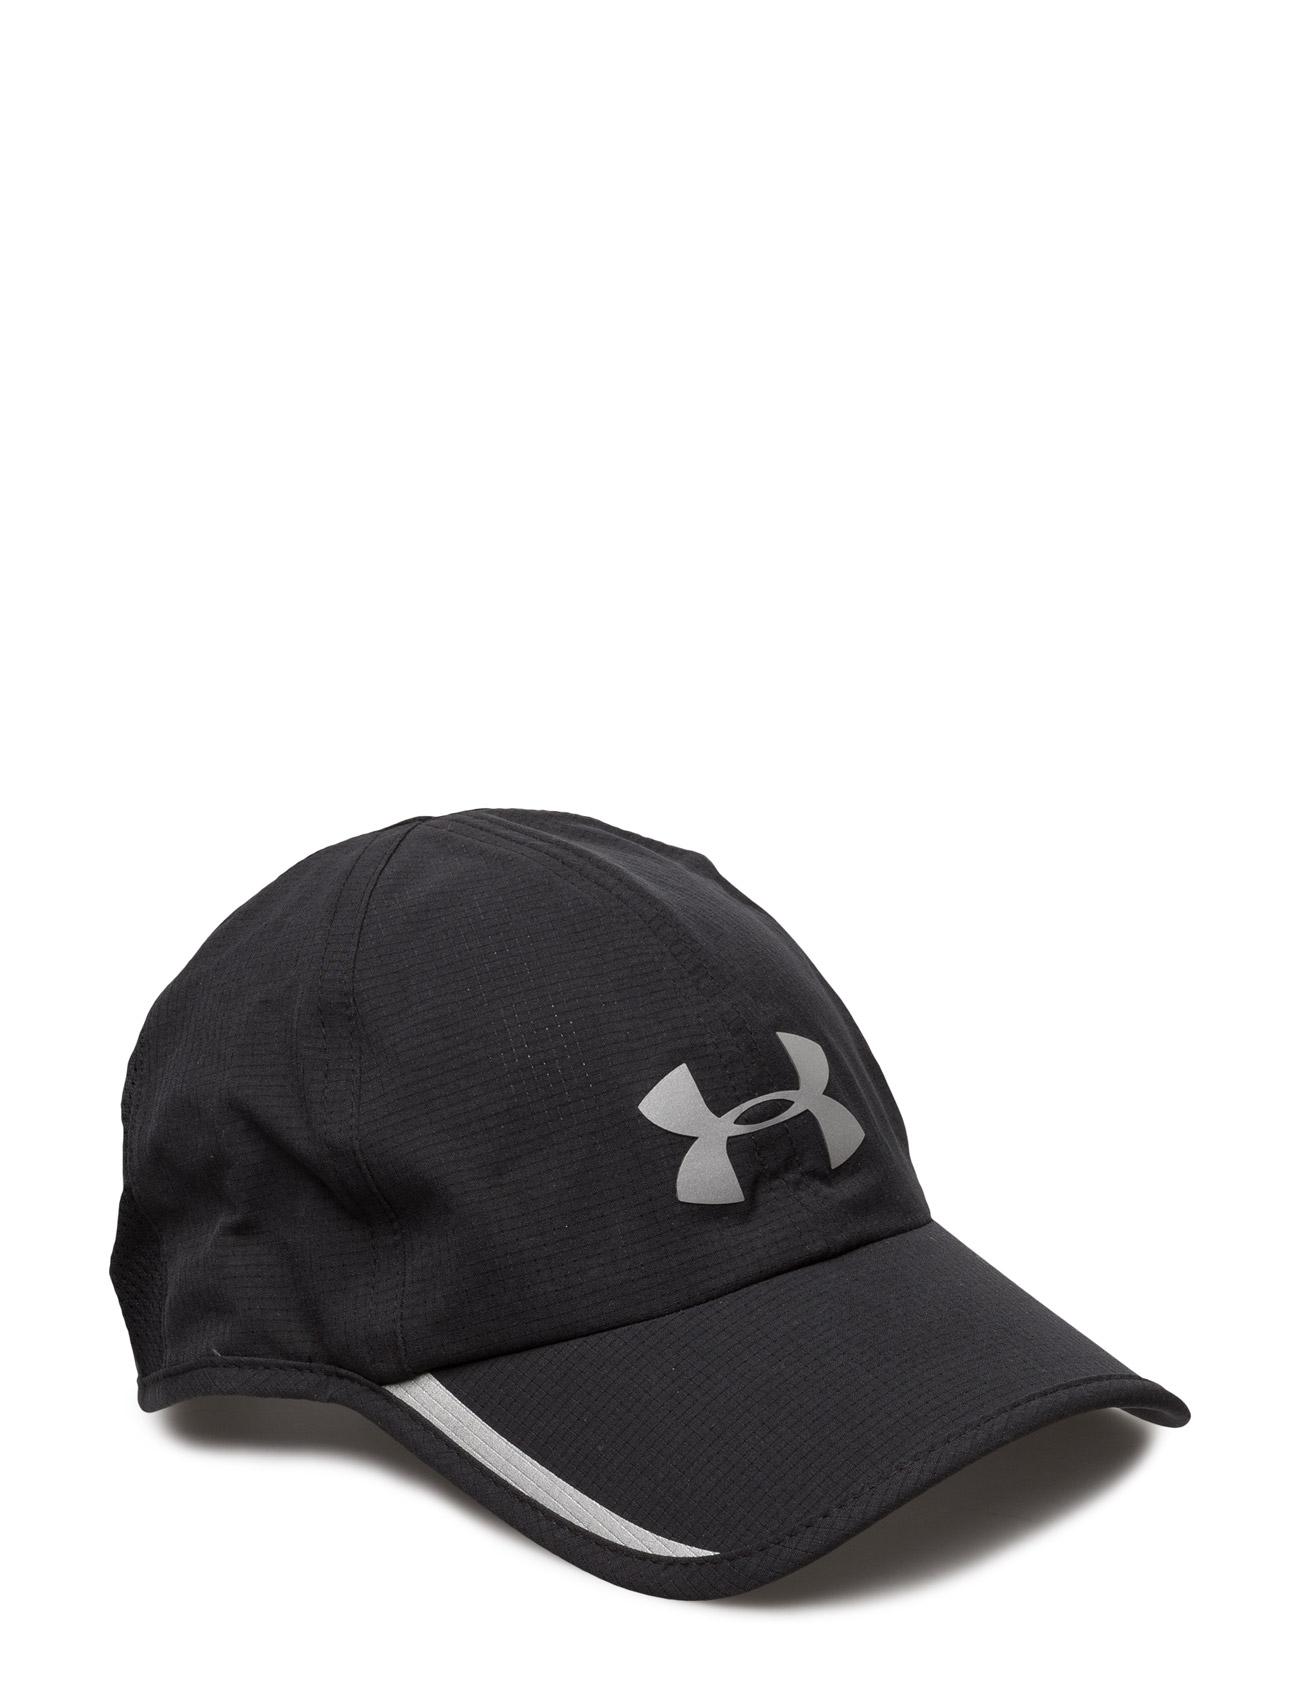 Men'S Ua Super Shadow Cap Under Armour Sports accessories til Mænd i hvid